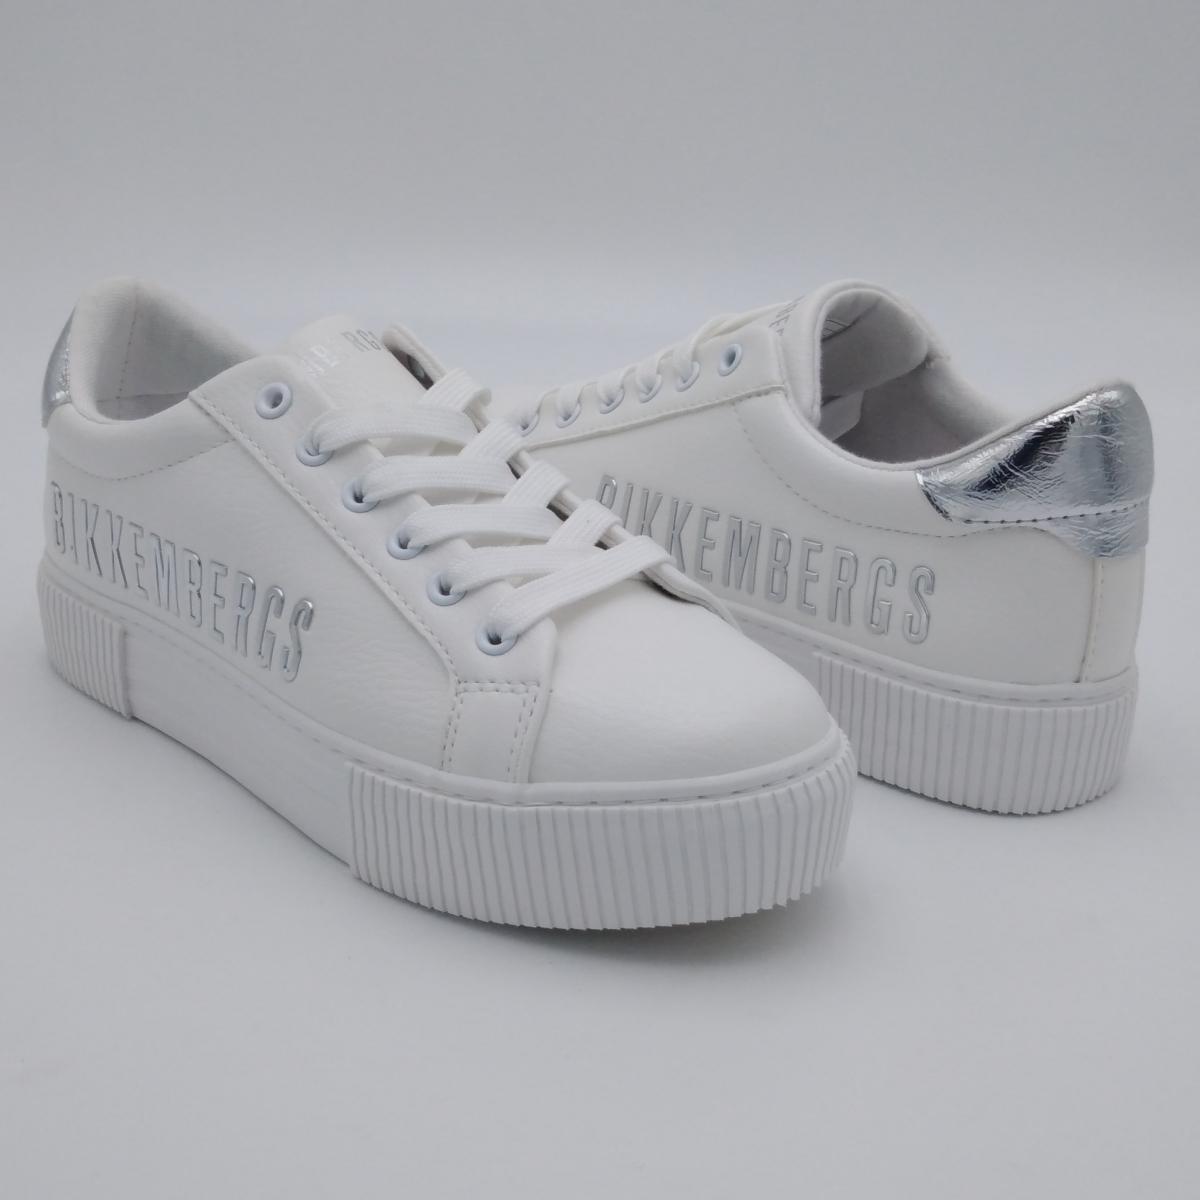 Bikkembergs -Sneaker lacci...